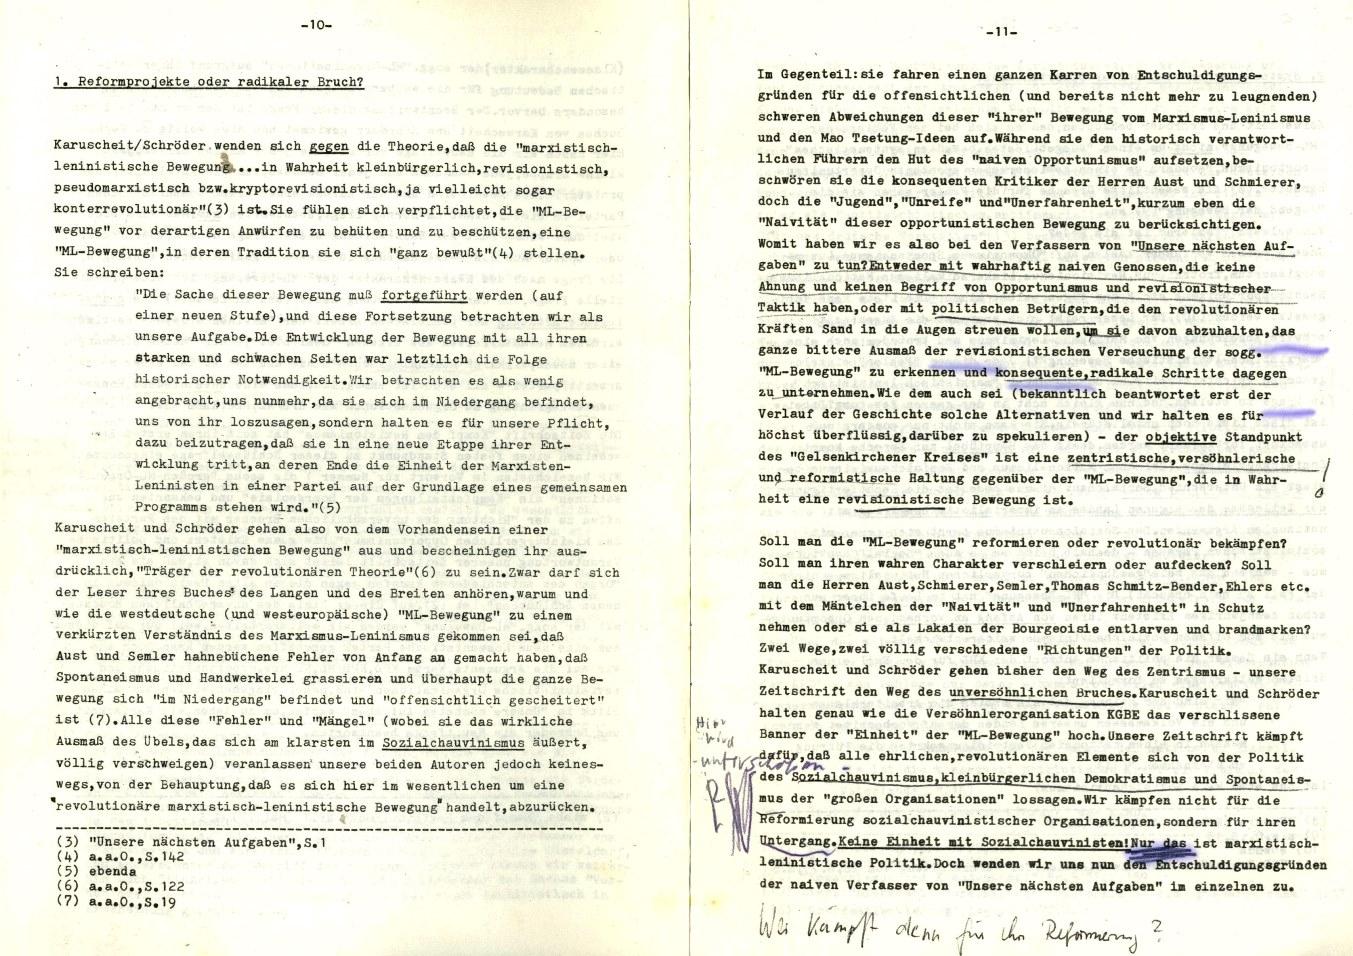 Muenchen_Kampf_dem_Revisionismus_1978_07_06